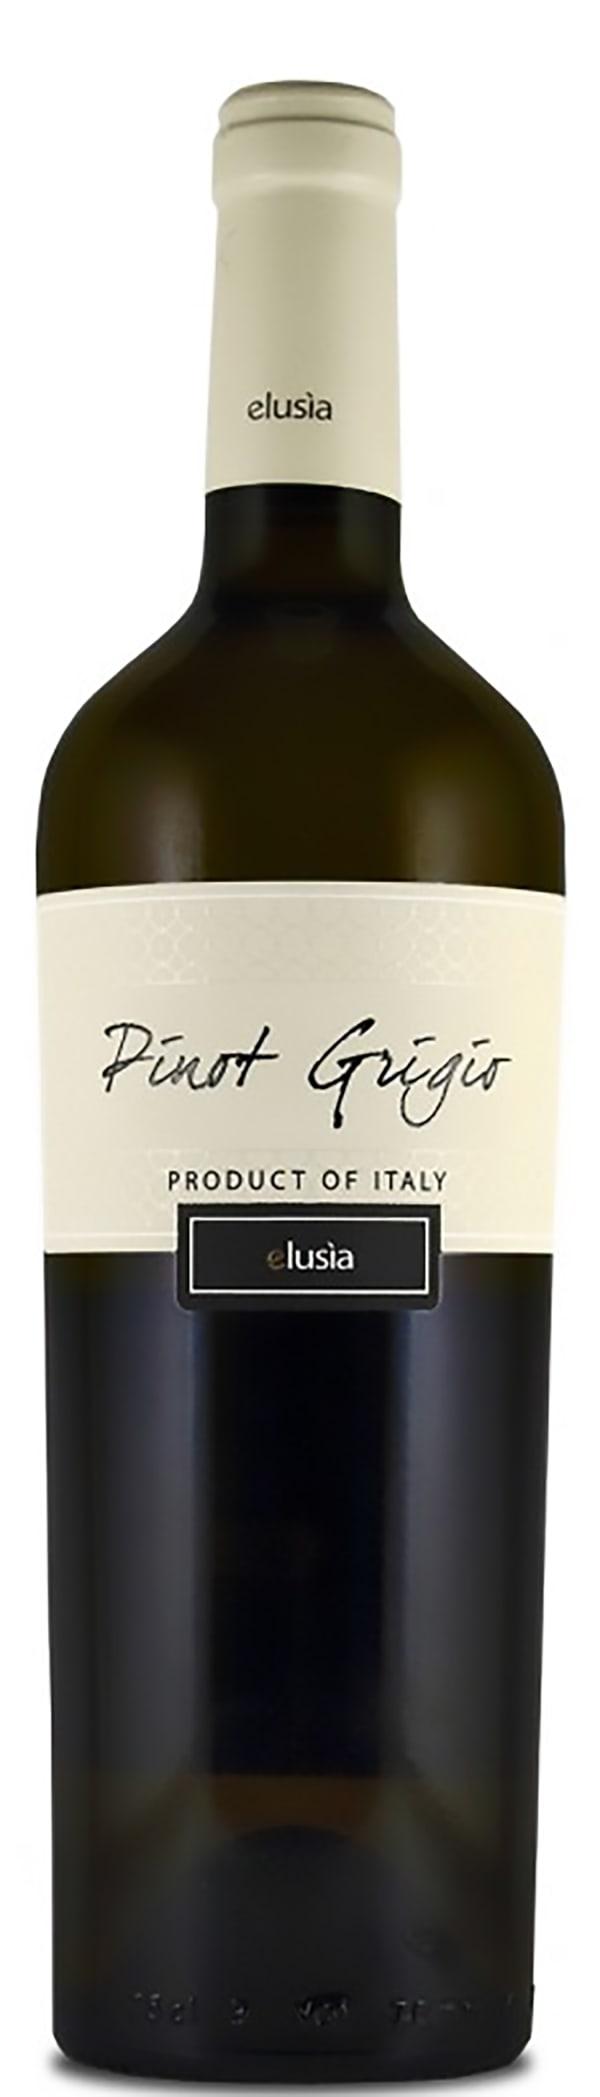 Elusìa Pinot Grigio 2017